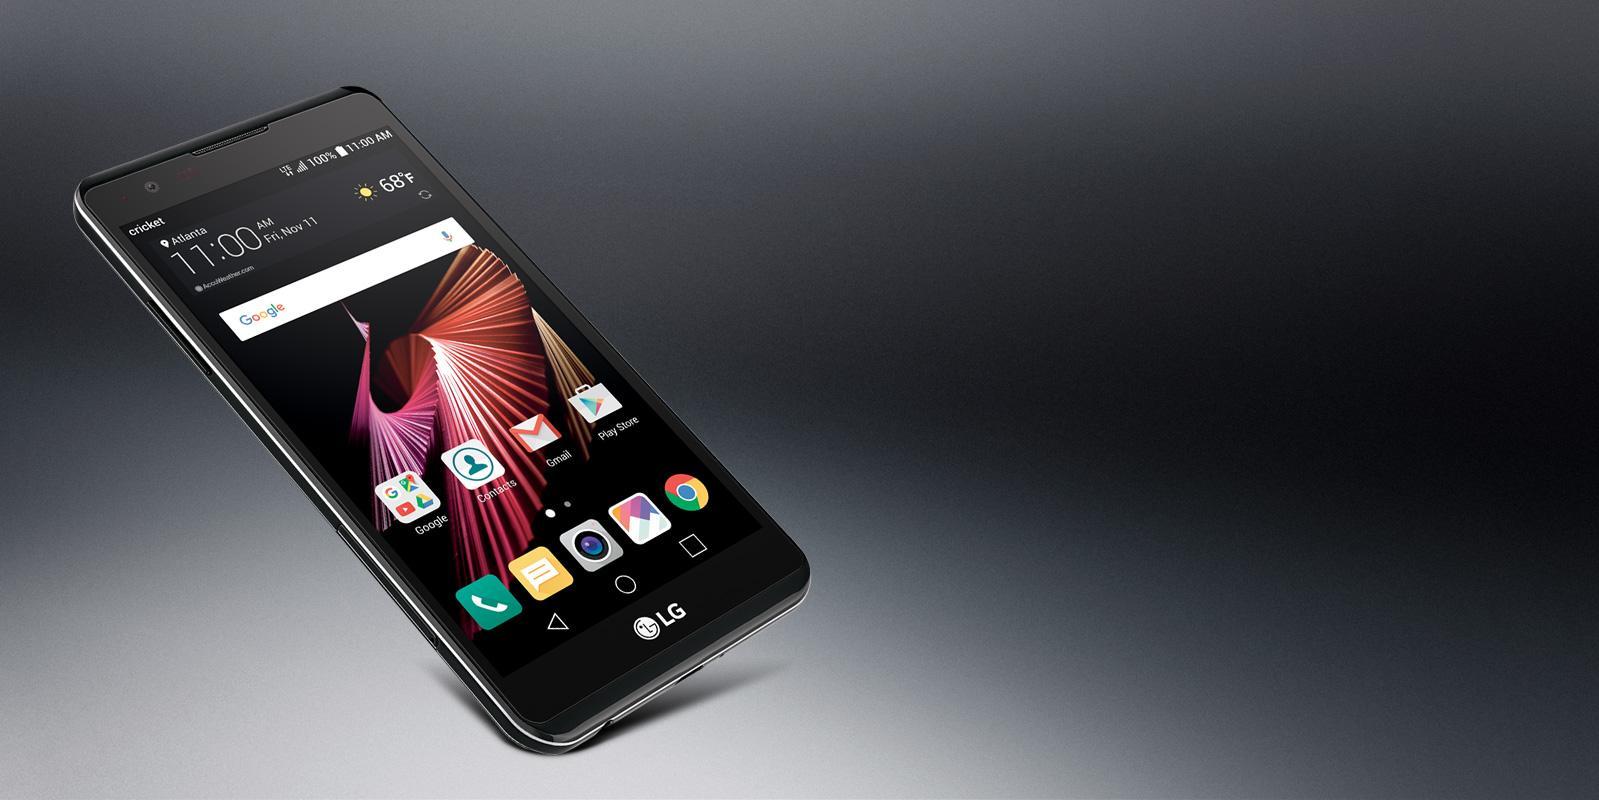 Cricket Phones by LG: View LG Cricket Wireless Phones | LG USA  Cricket Phones ...